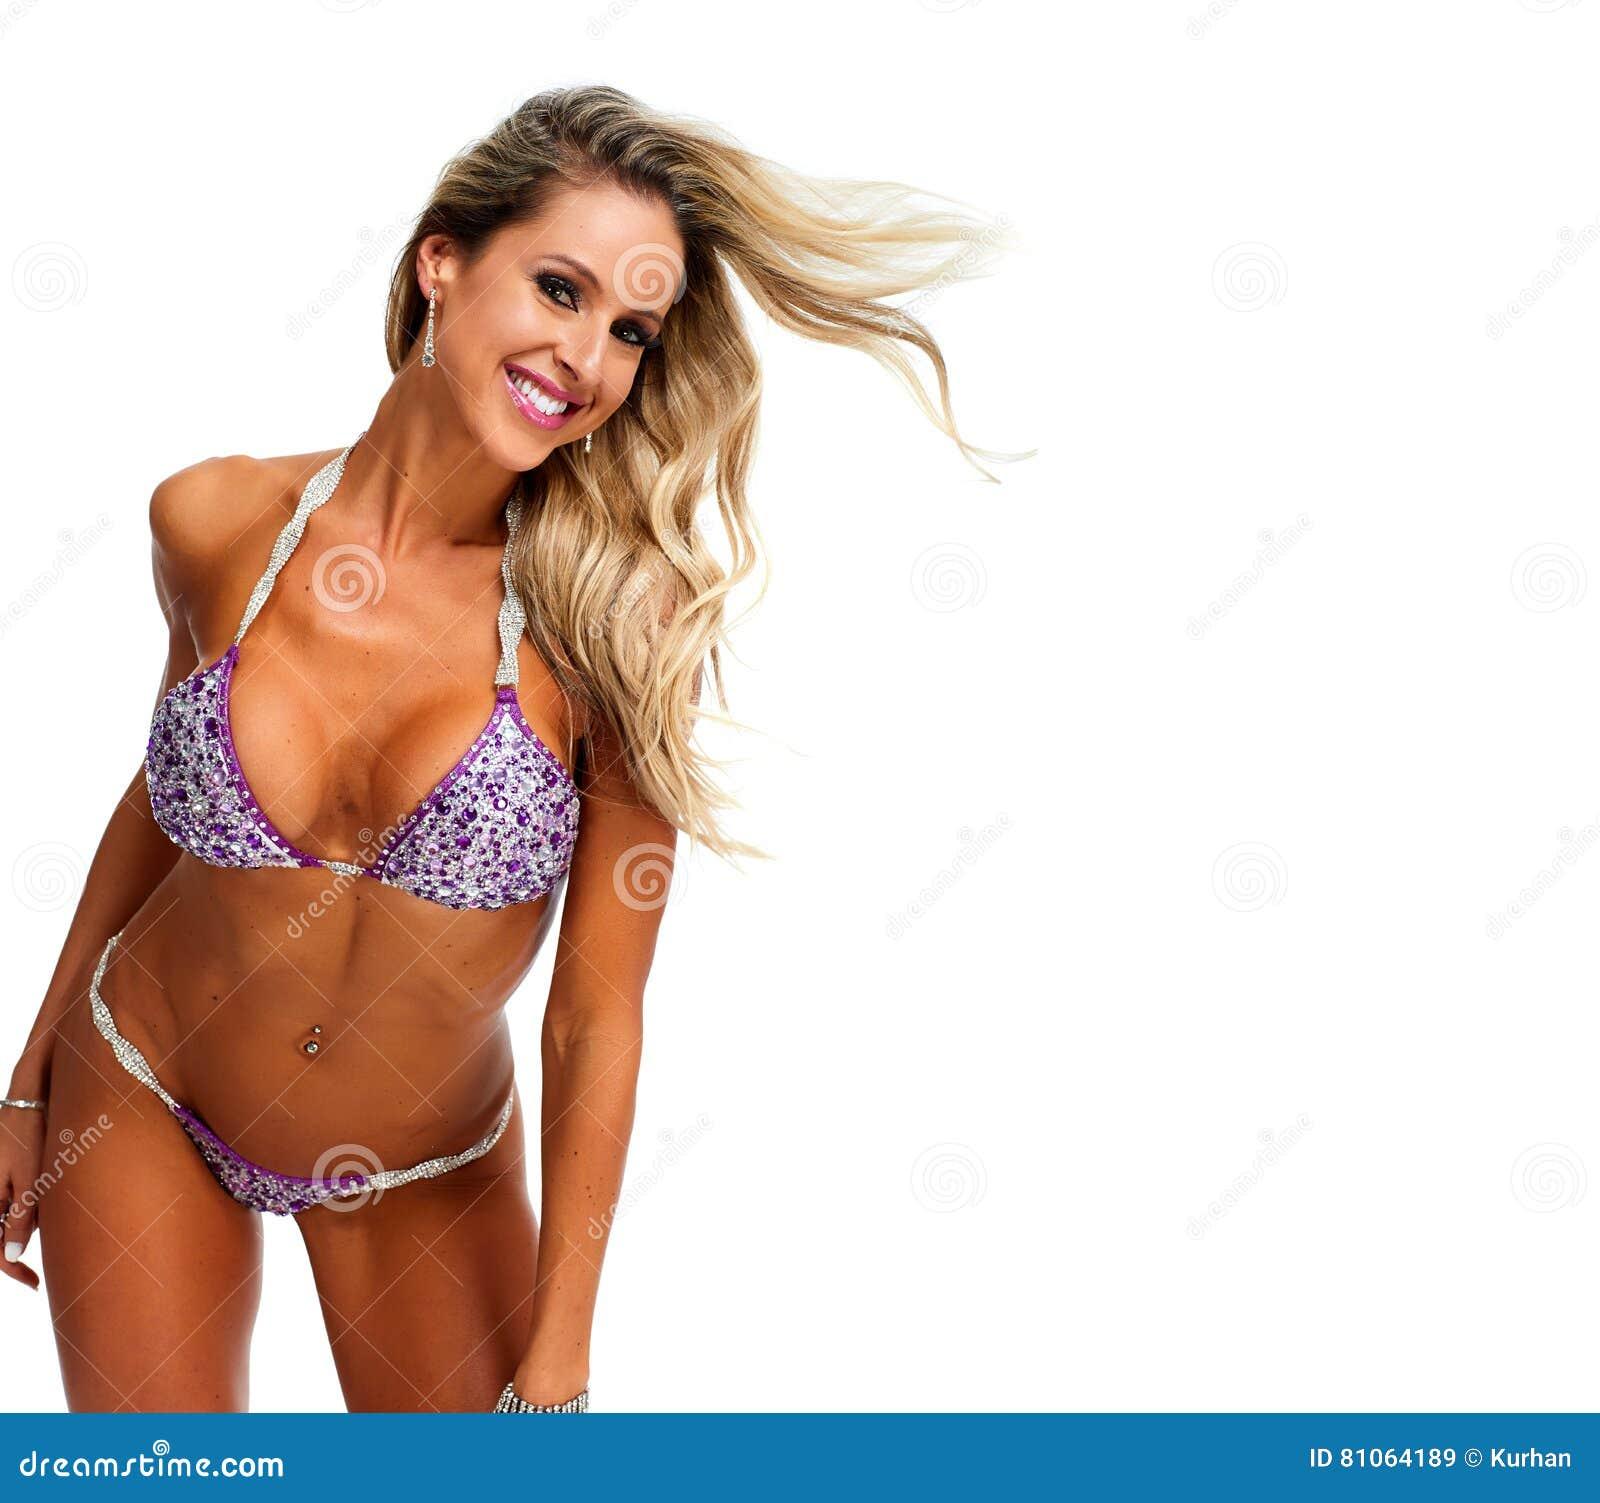 b5703b1c9c Young Athletic Girl With Body In Bikini. Stock Image - Image of ...